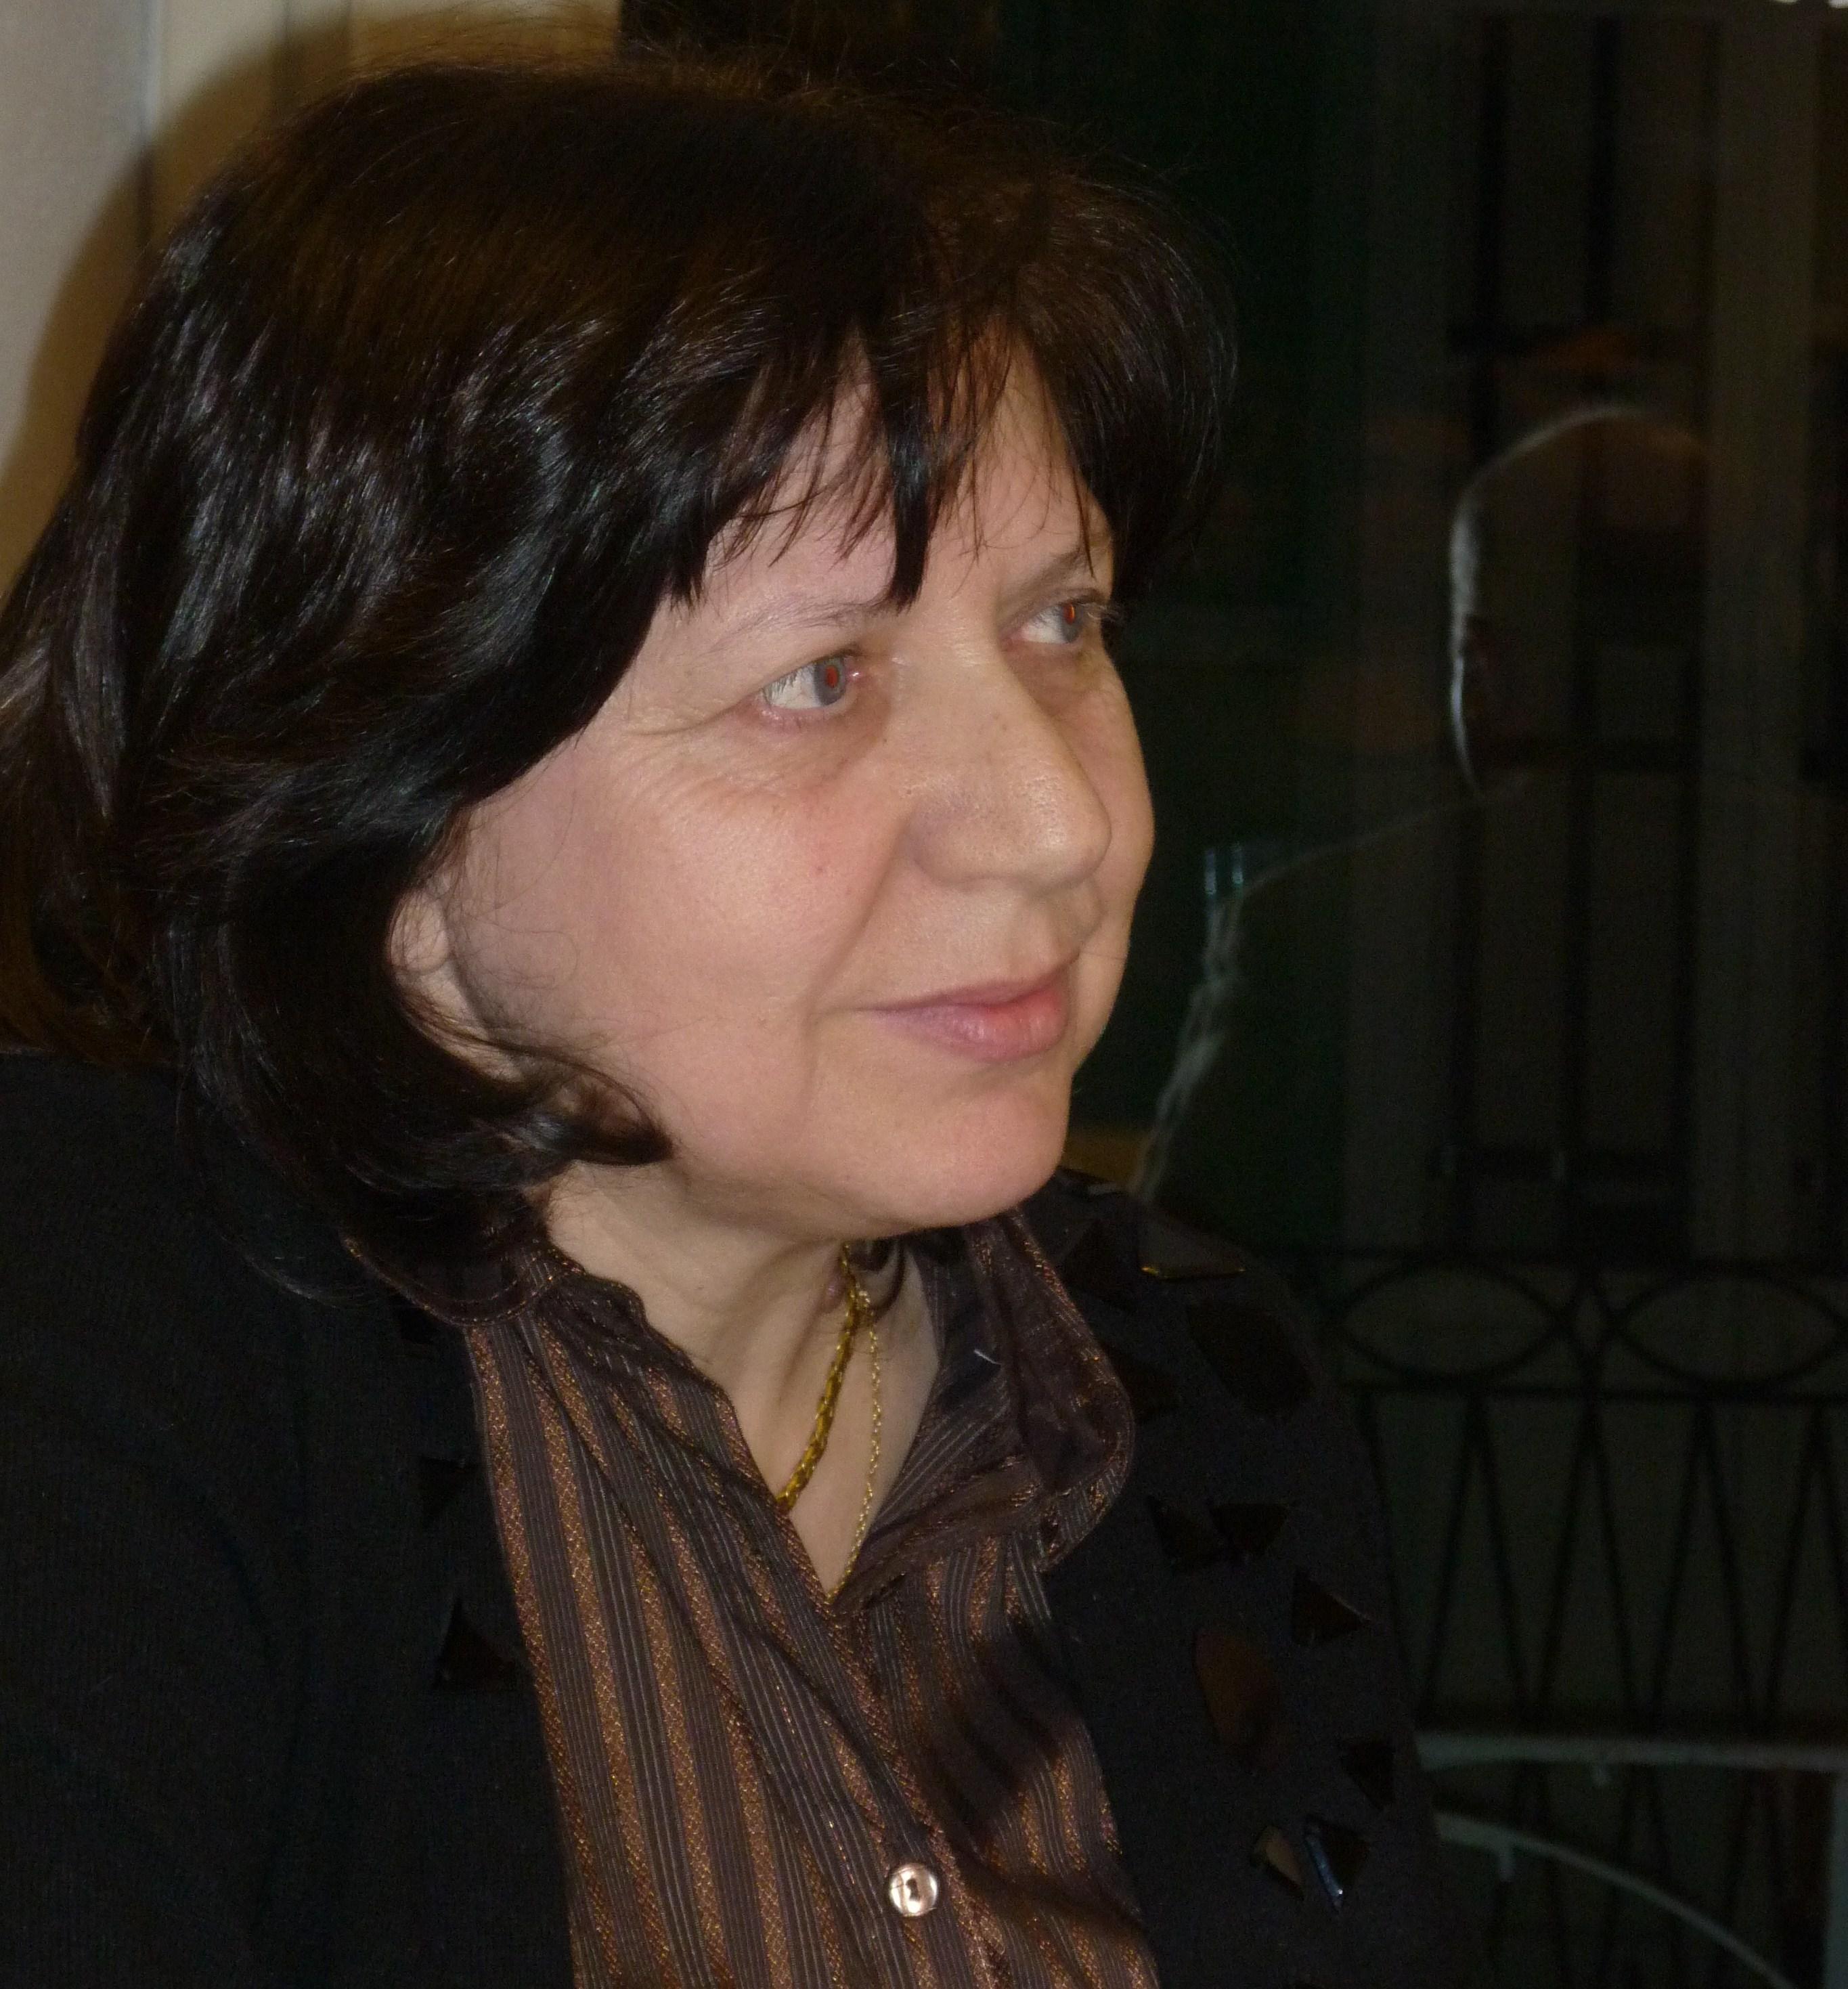 Annamaria Balossini (Italia) – piemontese/ita